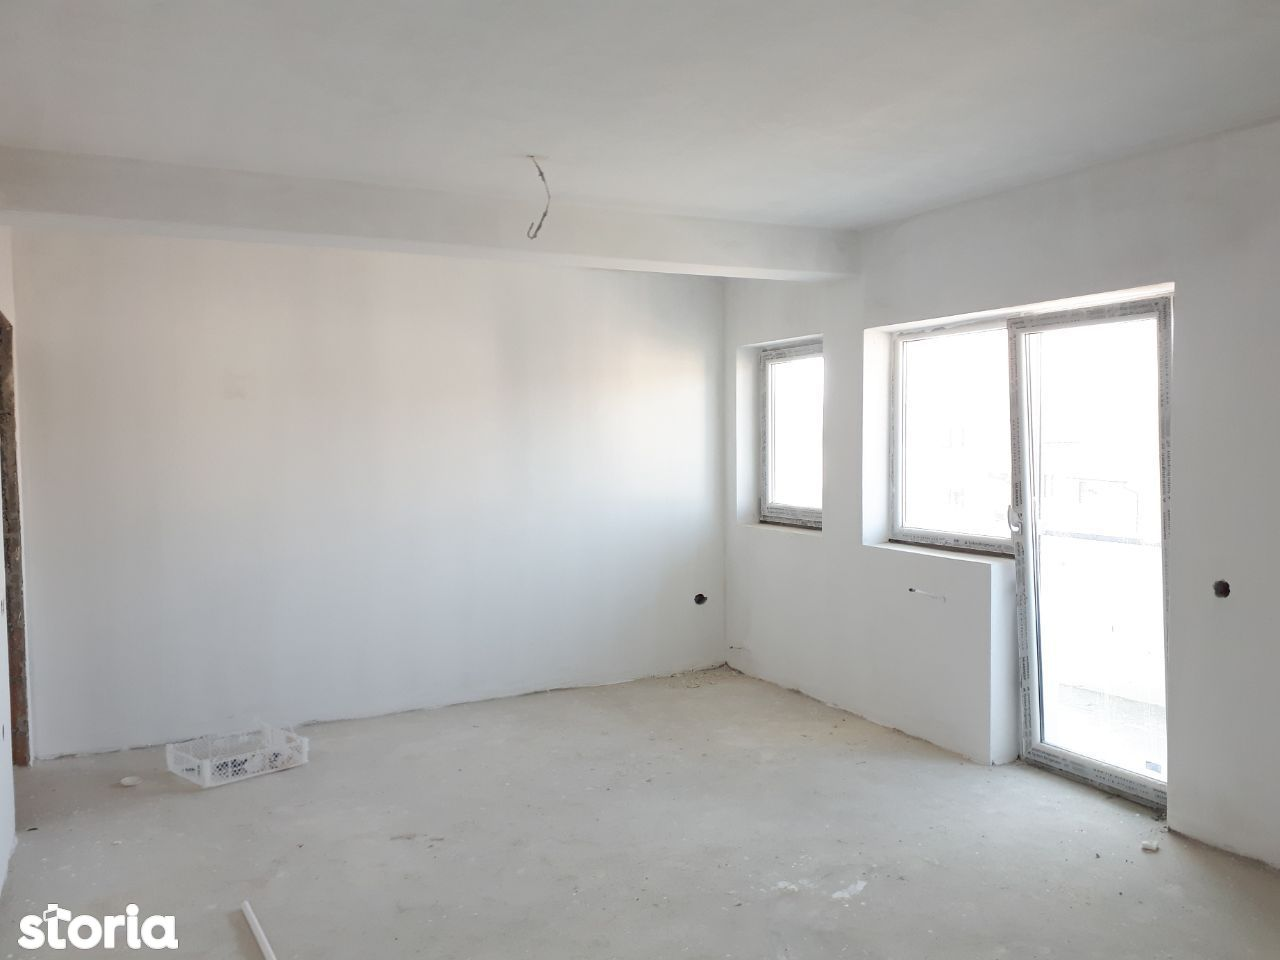 Dezvoltator apartam cu gradina 90mp 3cam 2bai 74mp utili+7mp balcon